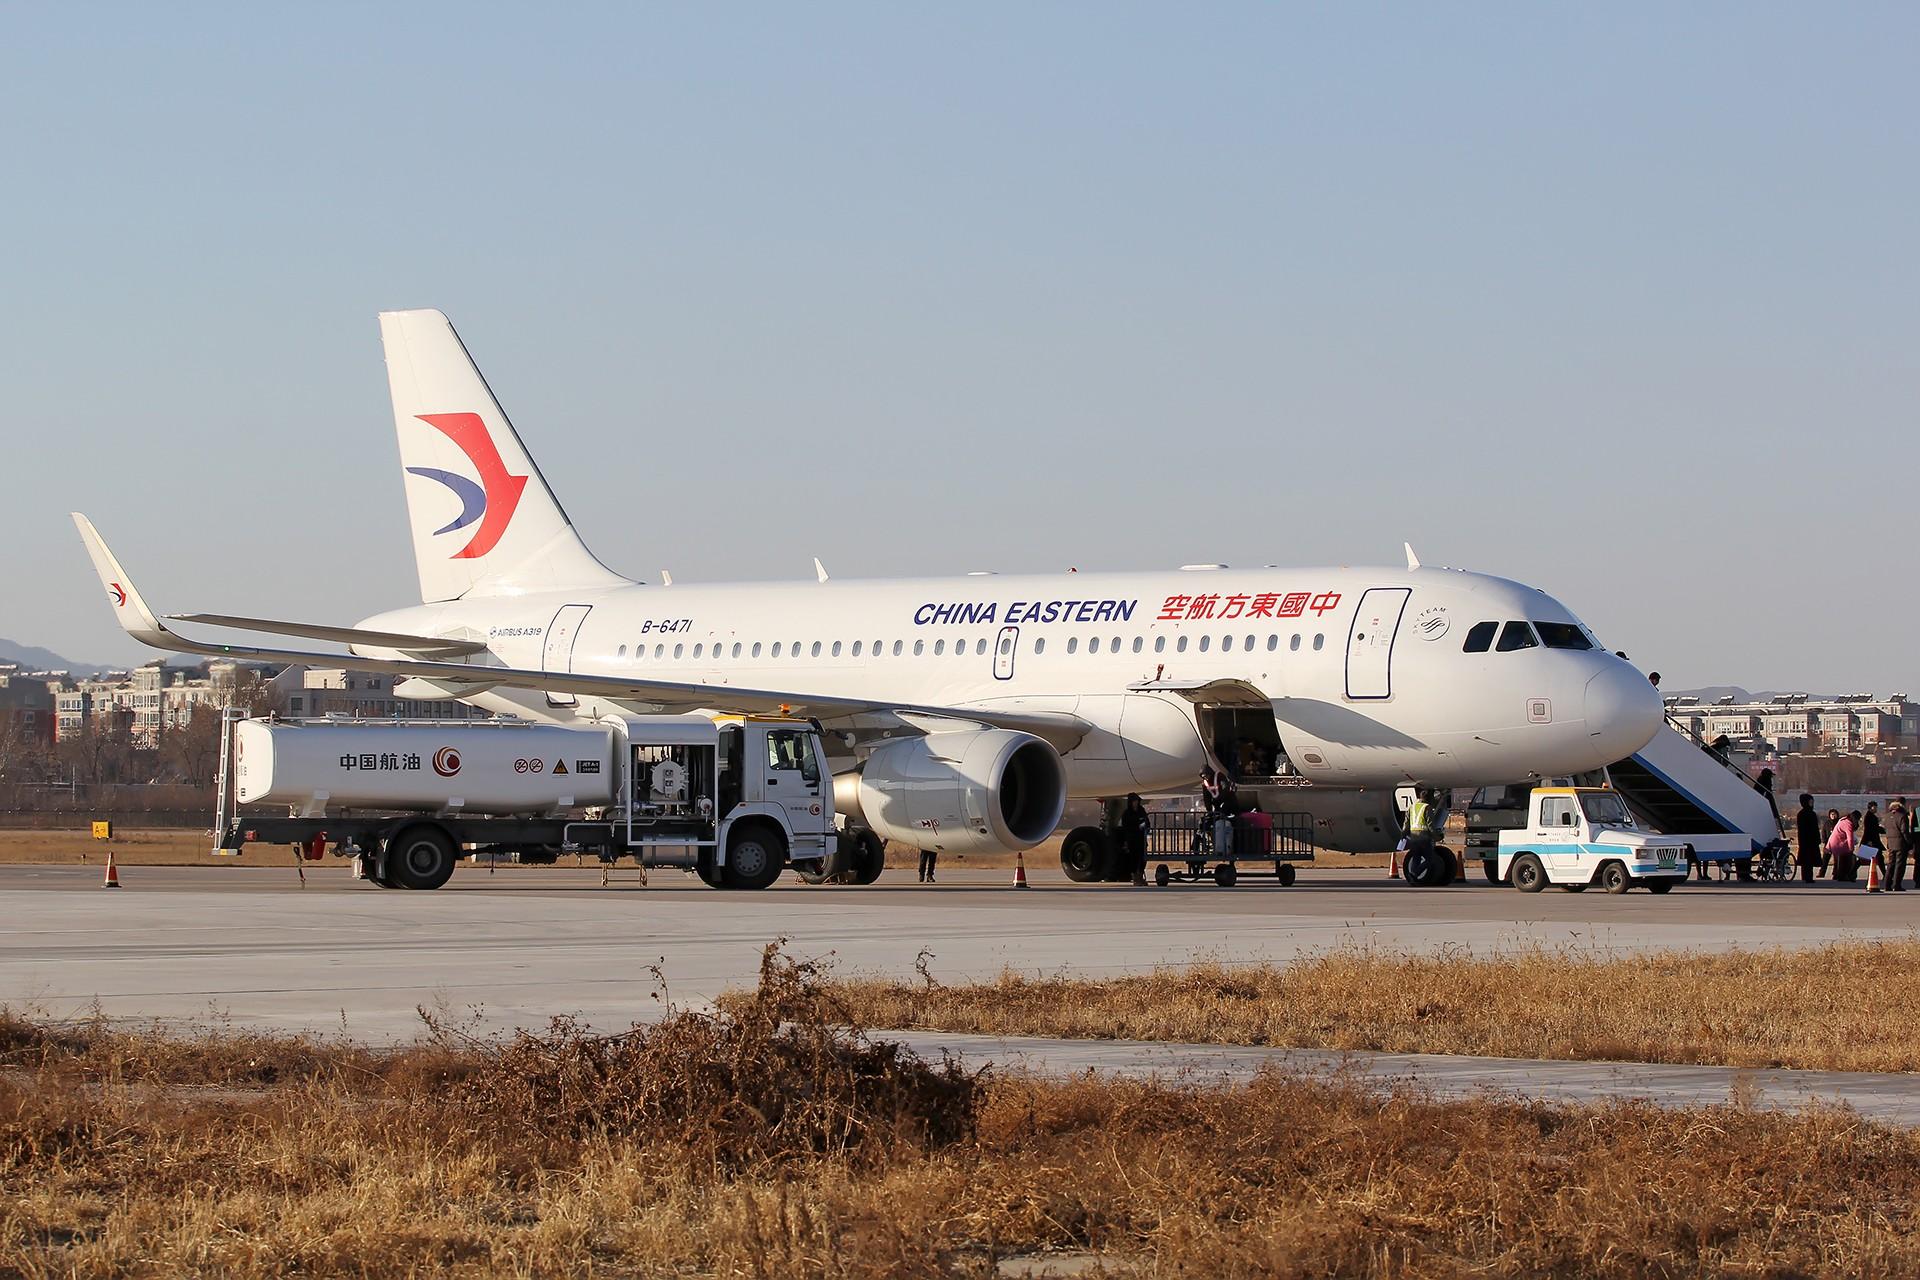 Re:[原创][CHG]。。。辽宁朝阳机场。。。 AIRBUS A319-100 B-6471 中国朝阳机场